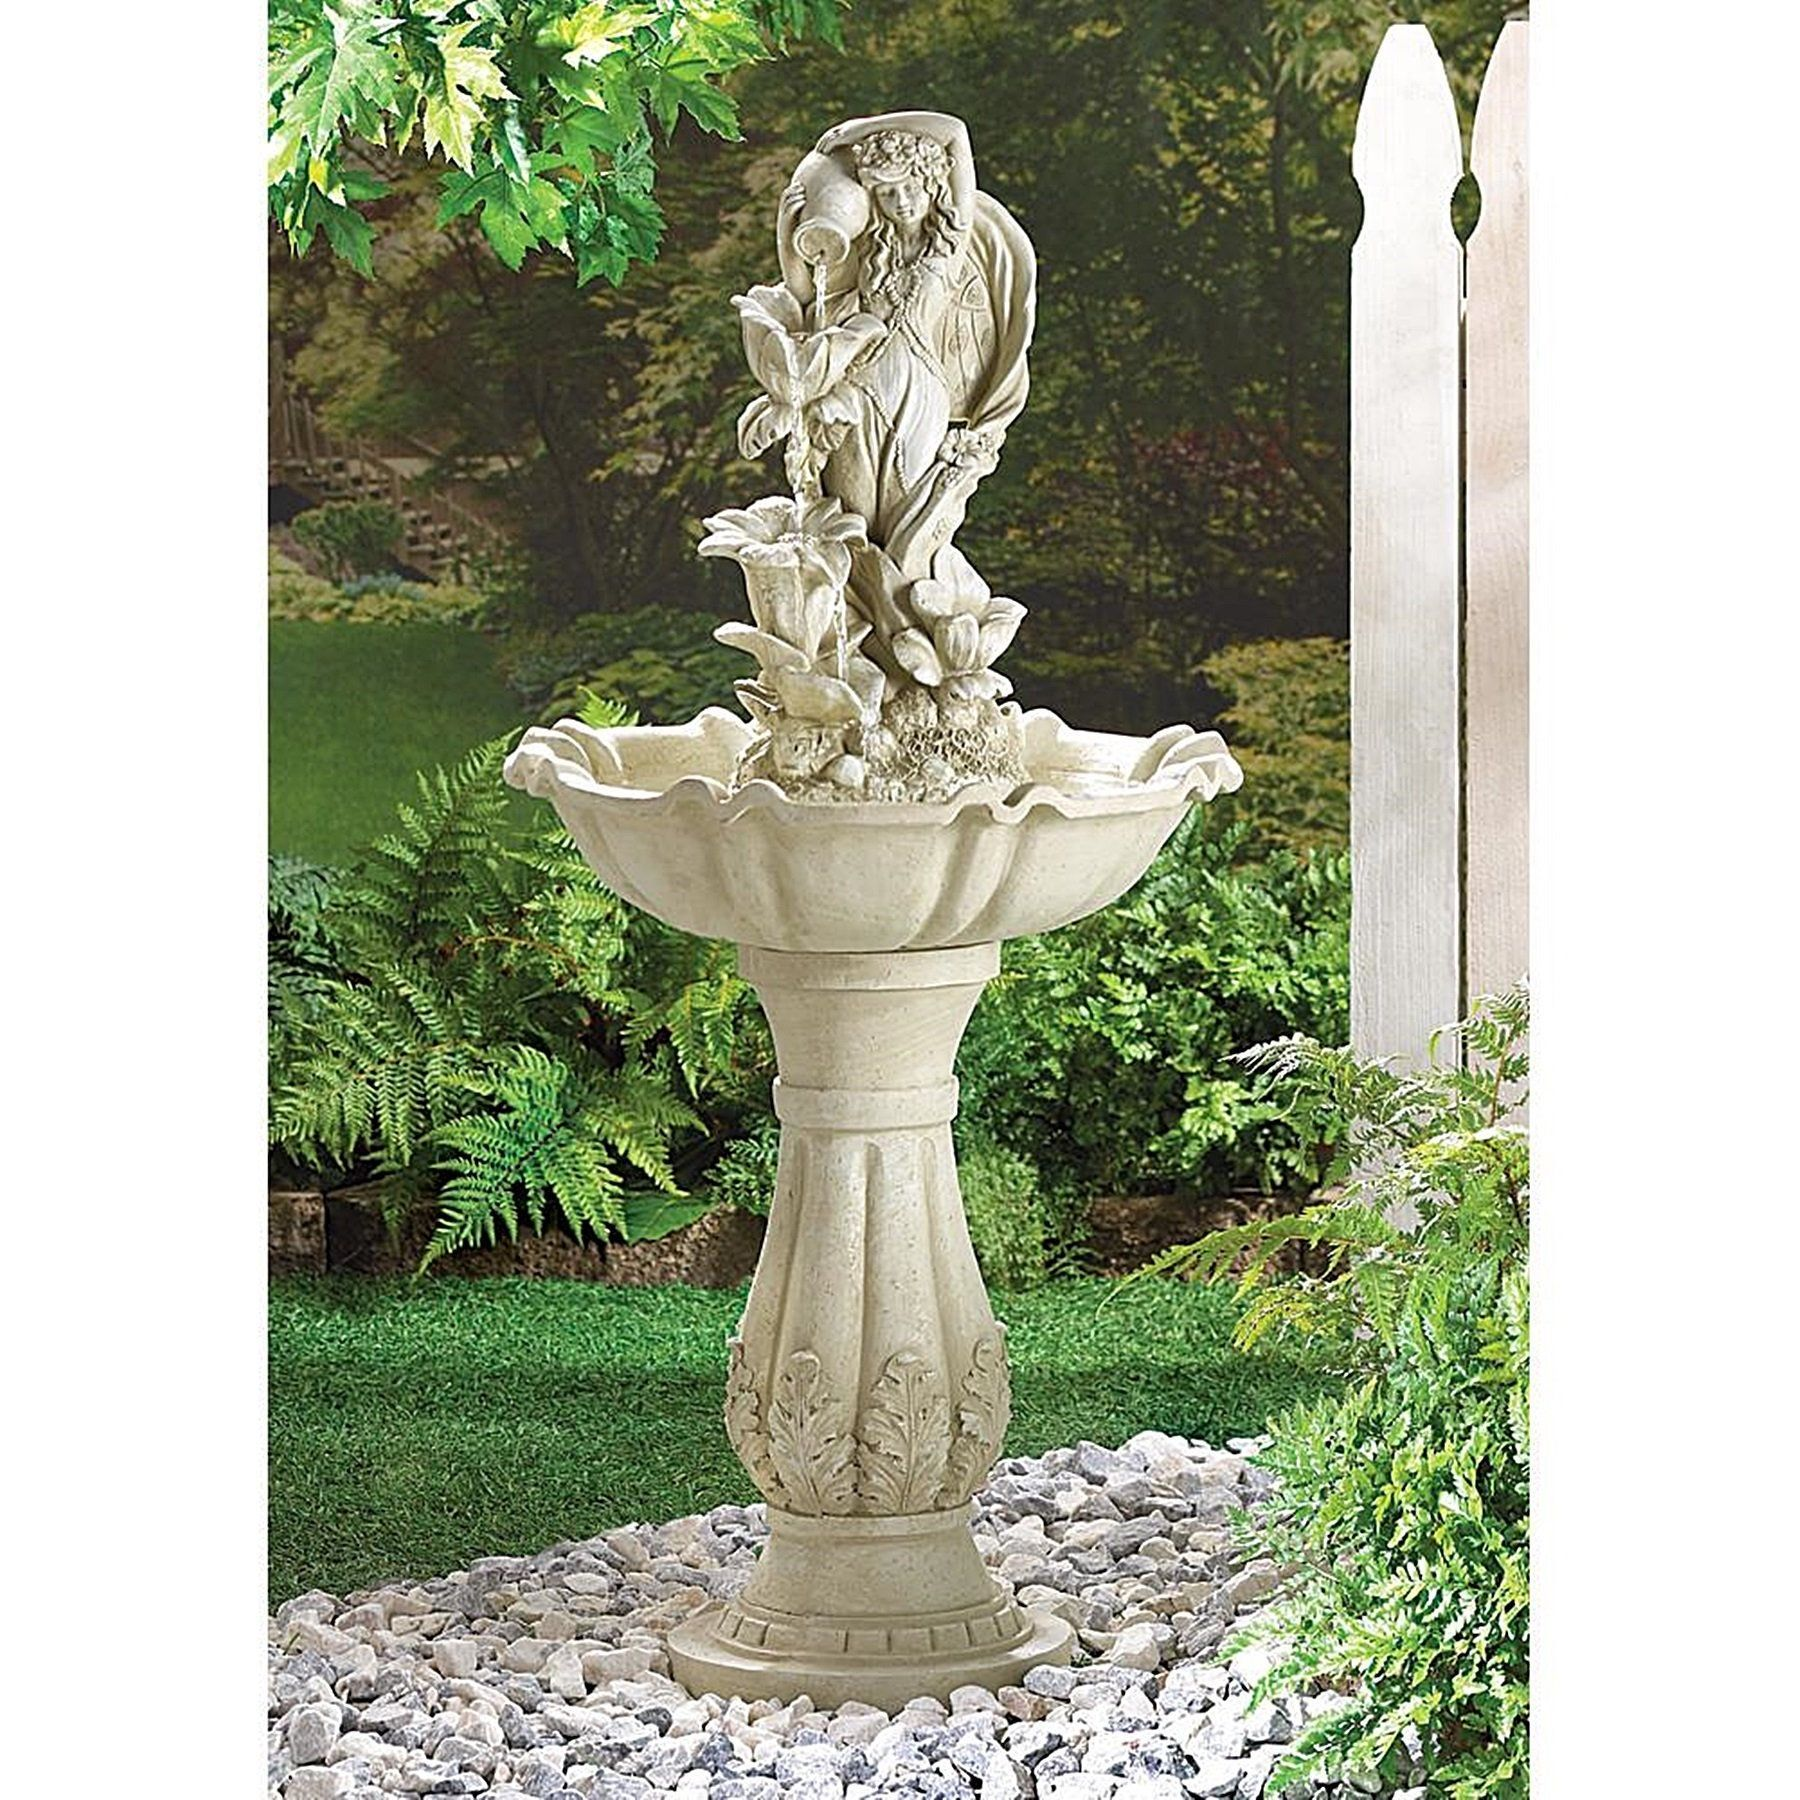 Healy Fairy Maiden Standing Water Fountain, Grey (Ceramic), Outdoor Décor